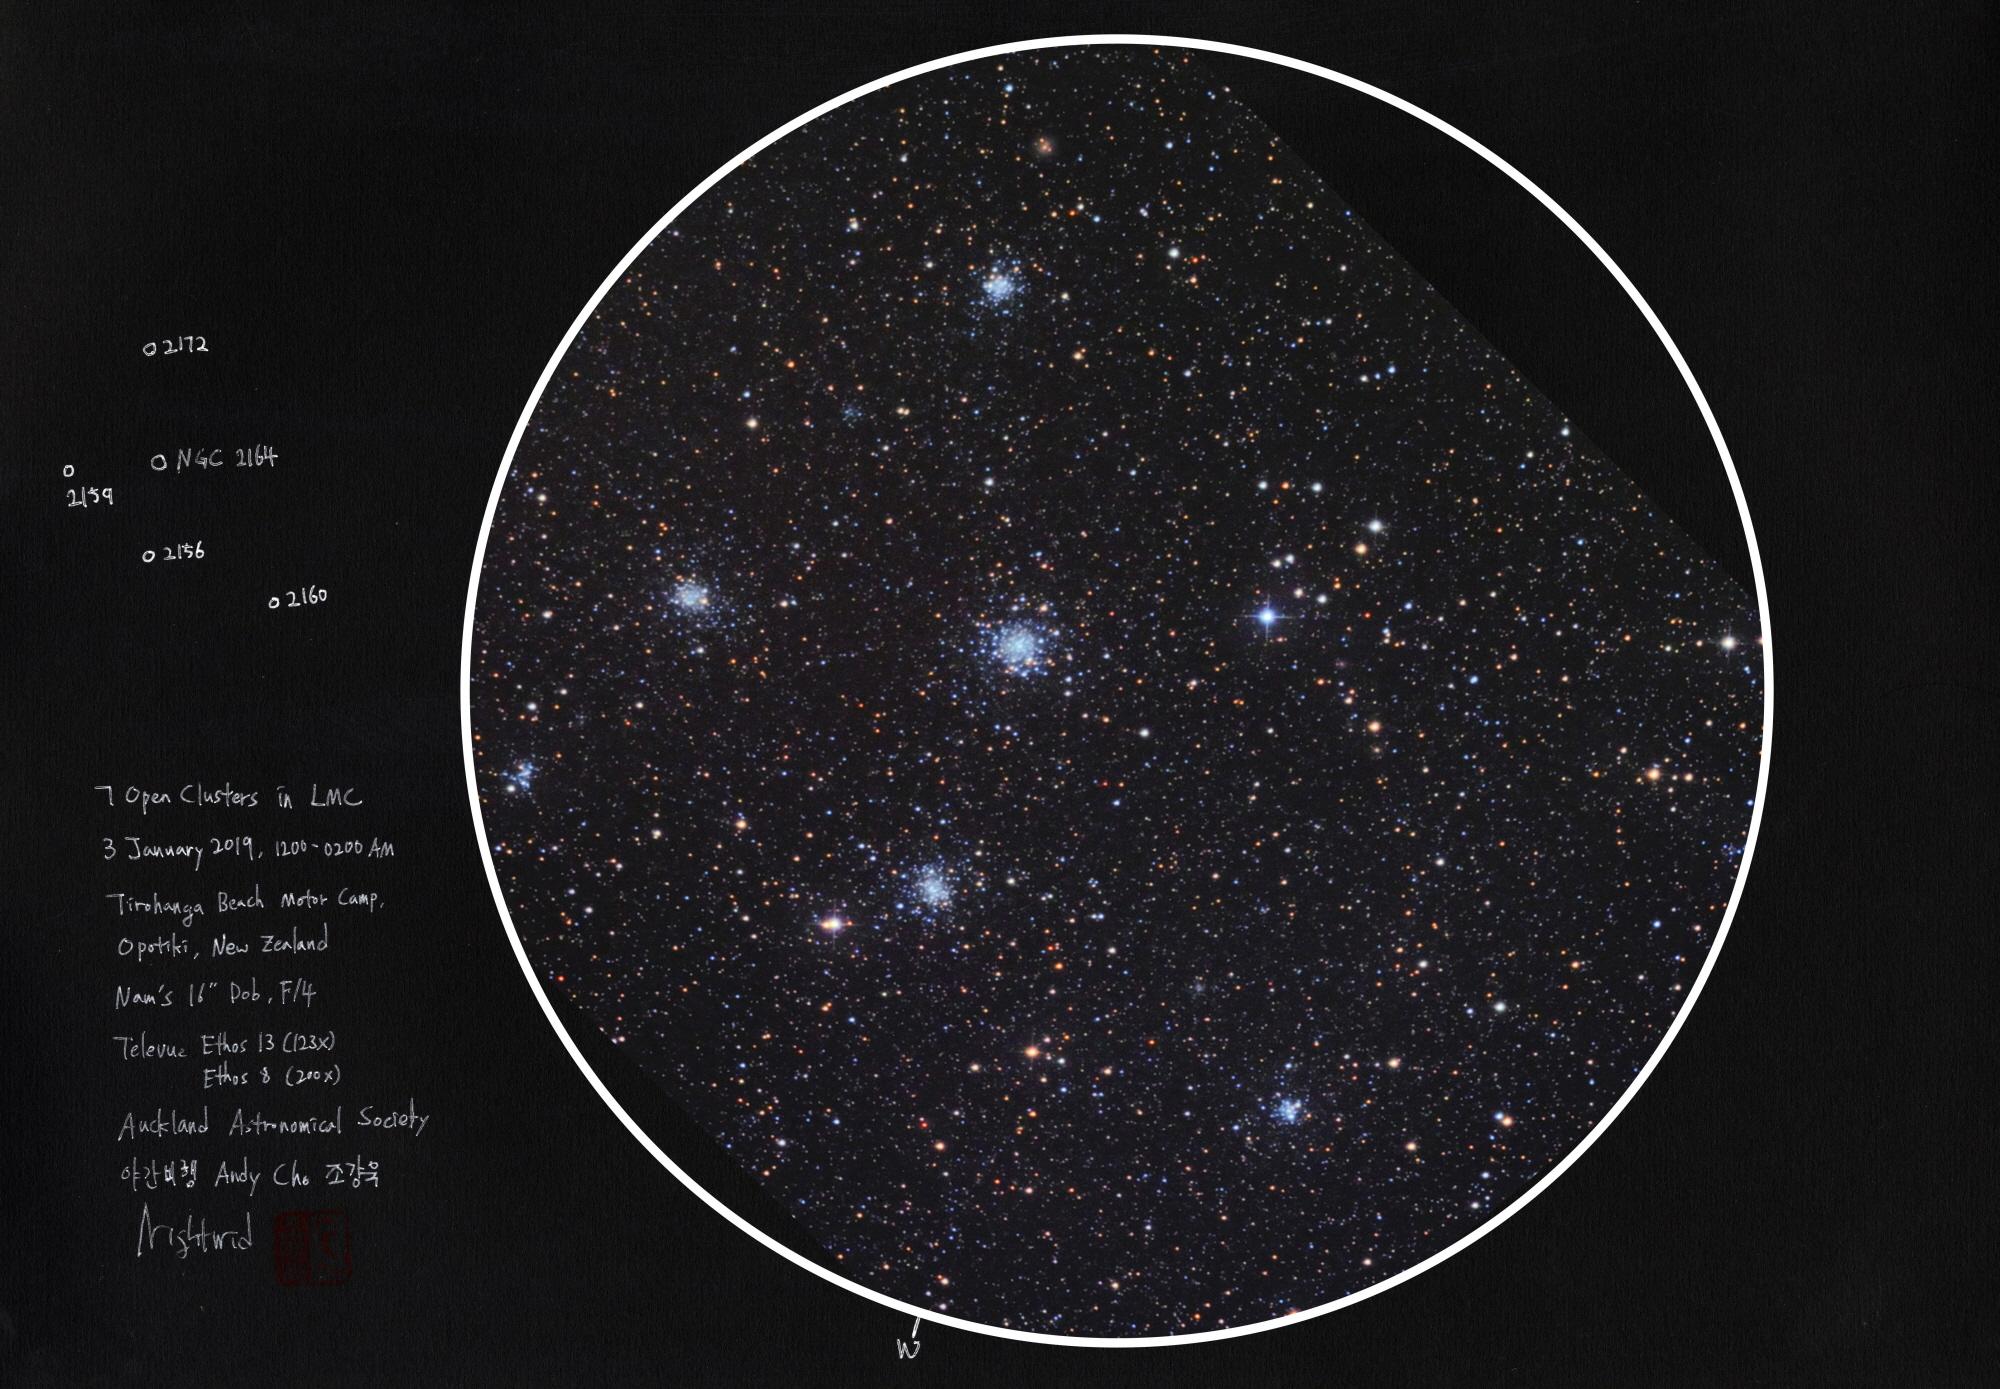 2000_NGC2164_compare_190103.jpg